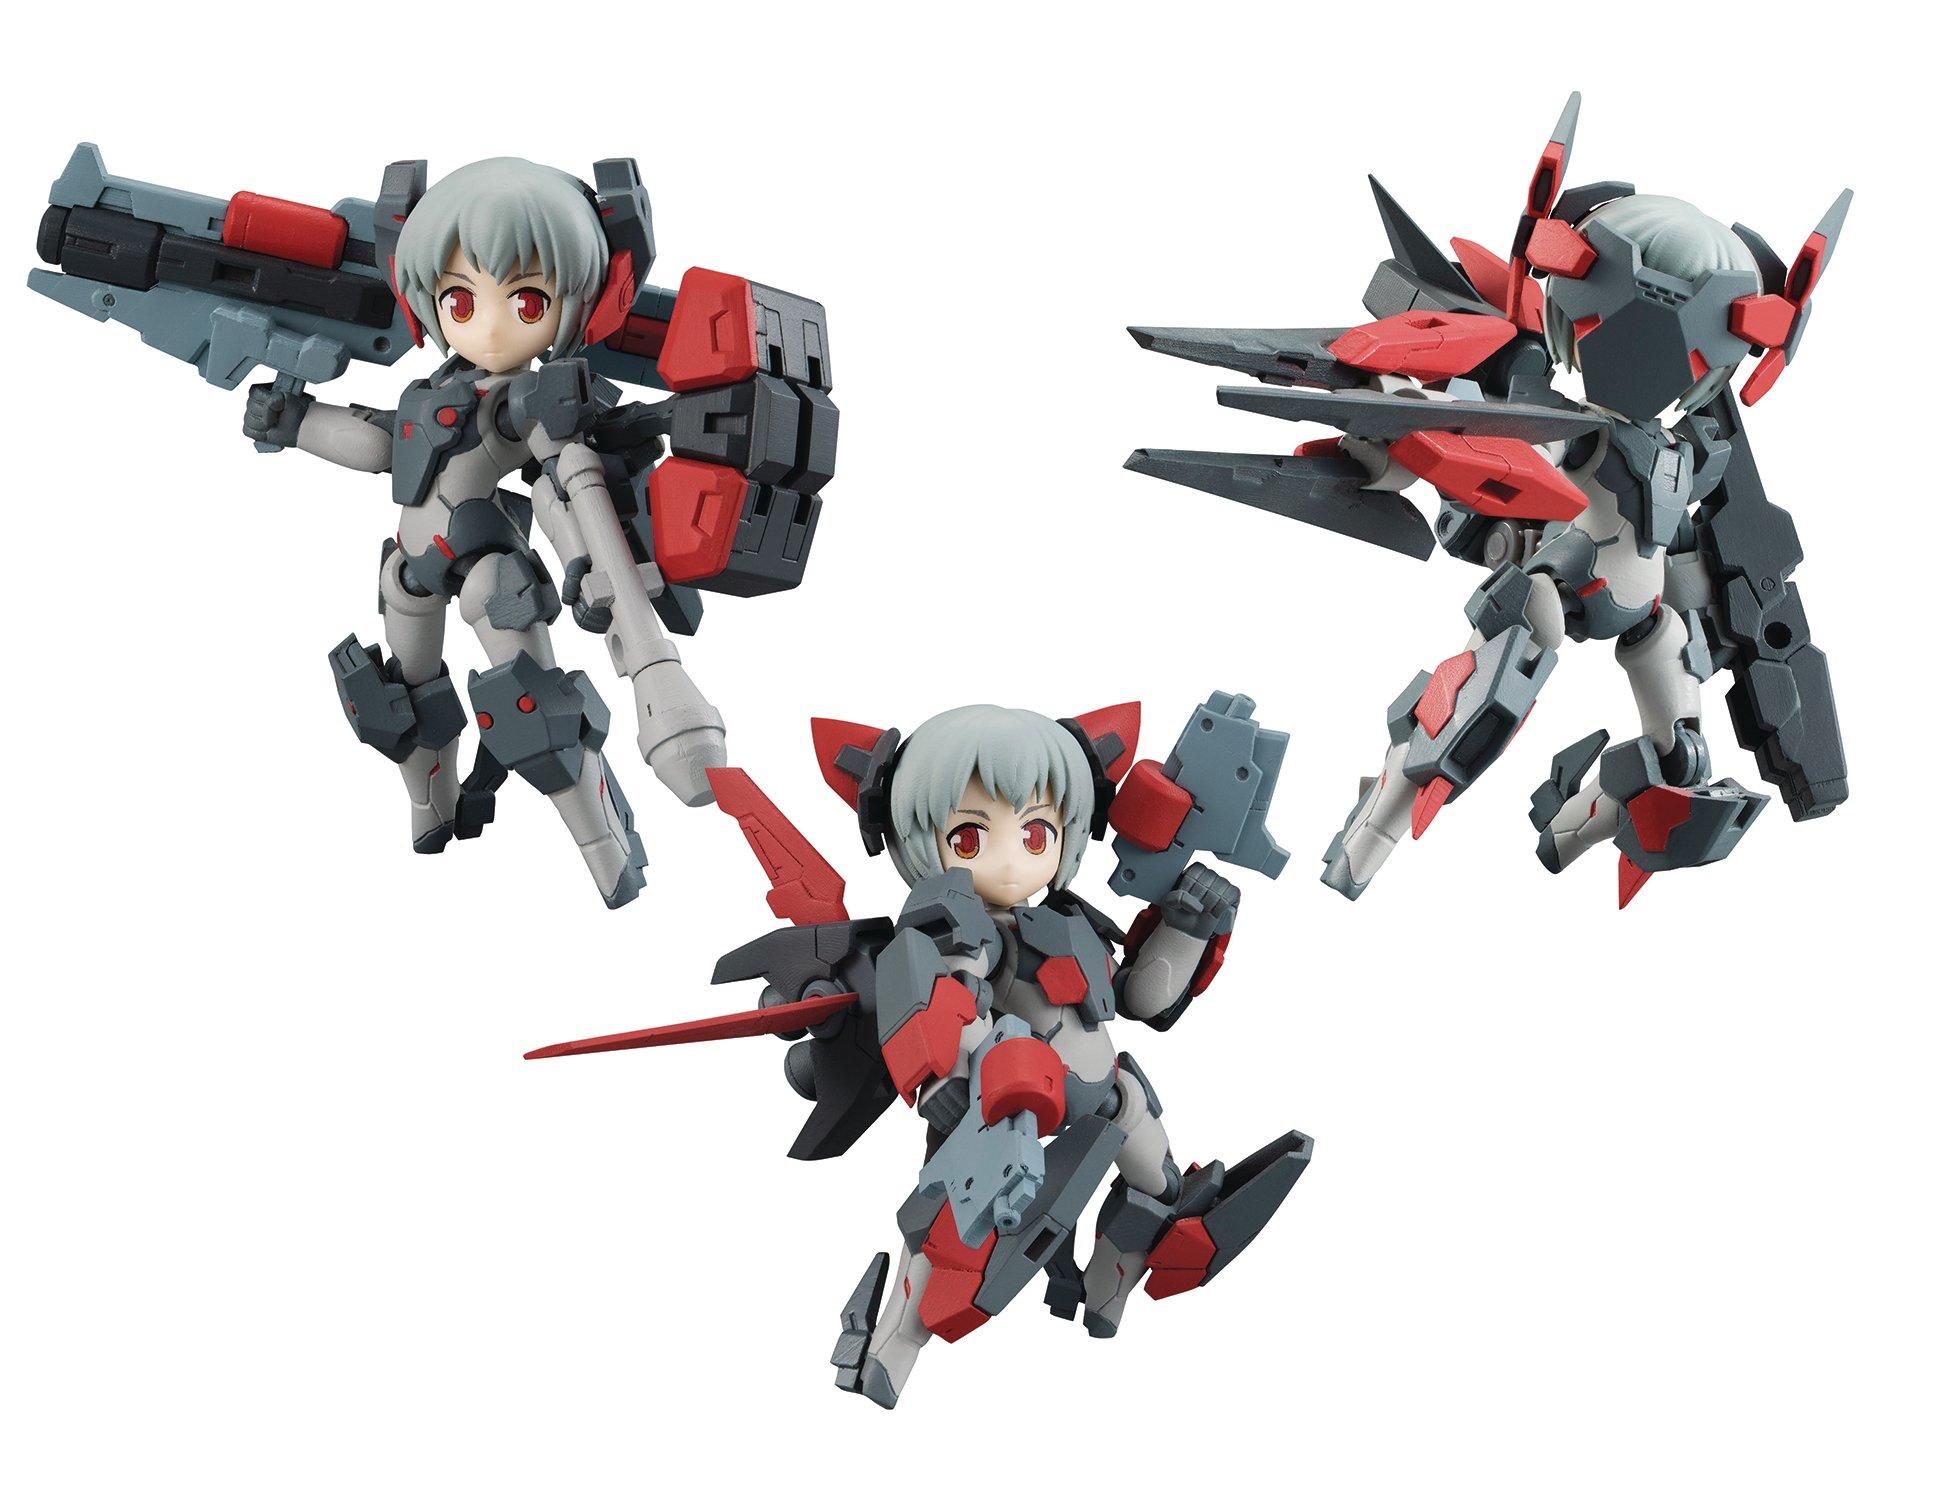 Megahouse Desk Top Army: Y-021D Millenia Series Beta Version Poseable Figure Set